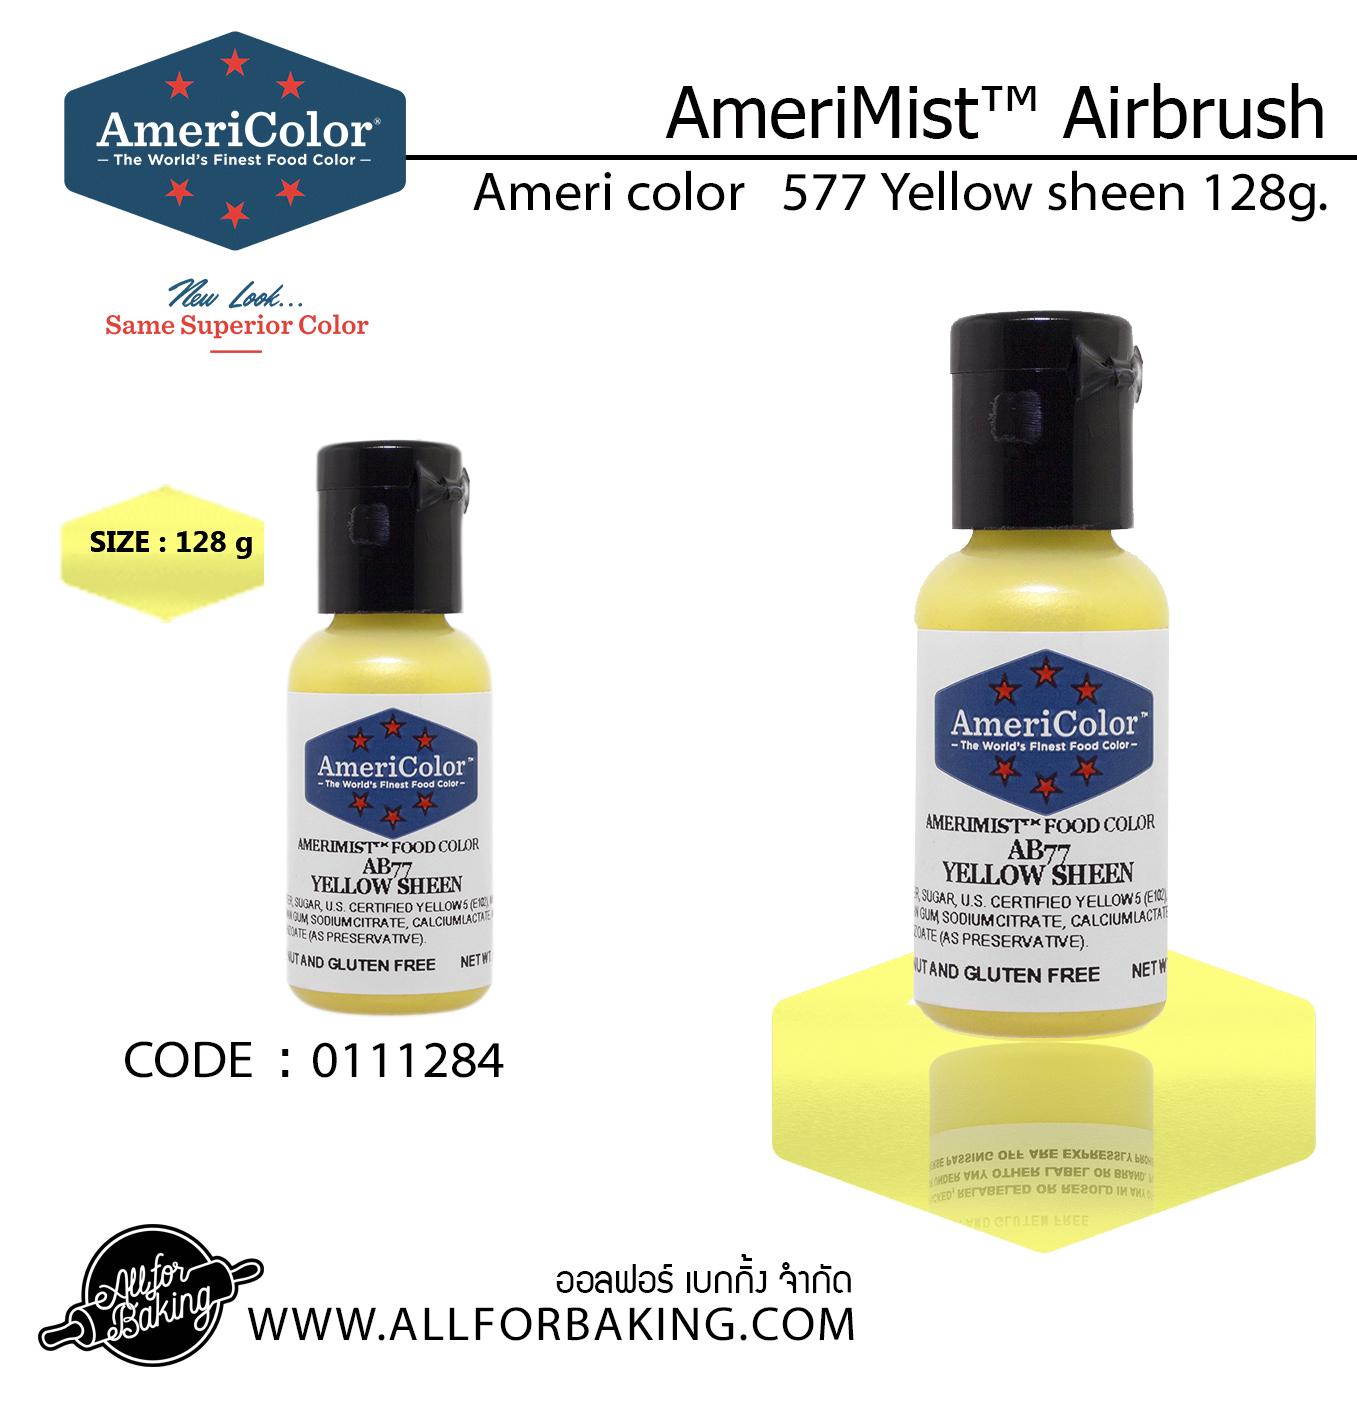 Ameri color 577 Yellow sheen 128g. (128 g)